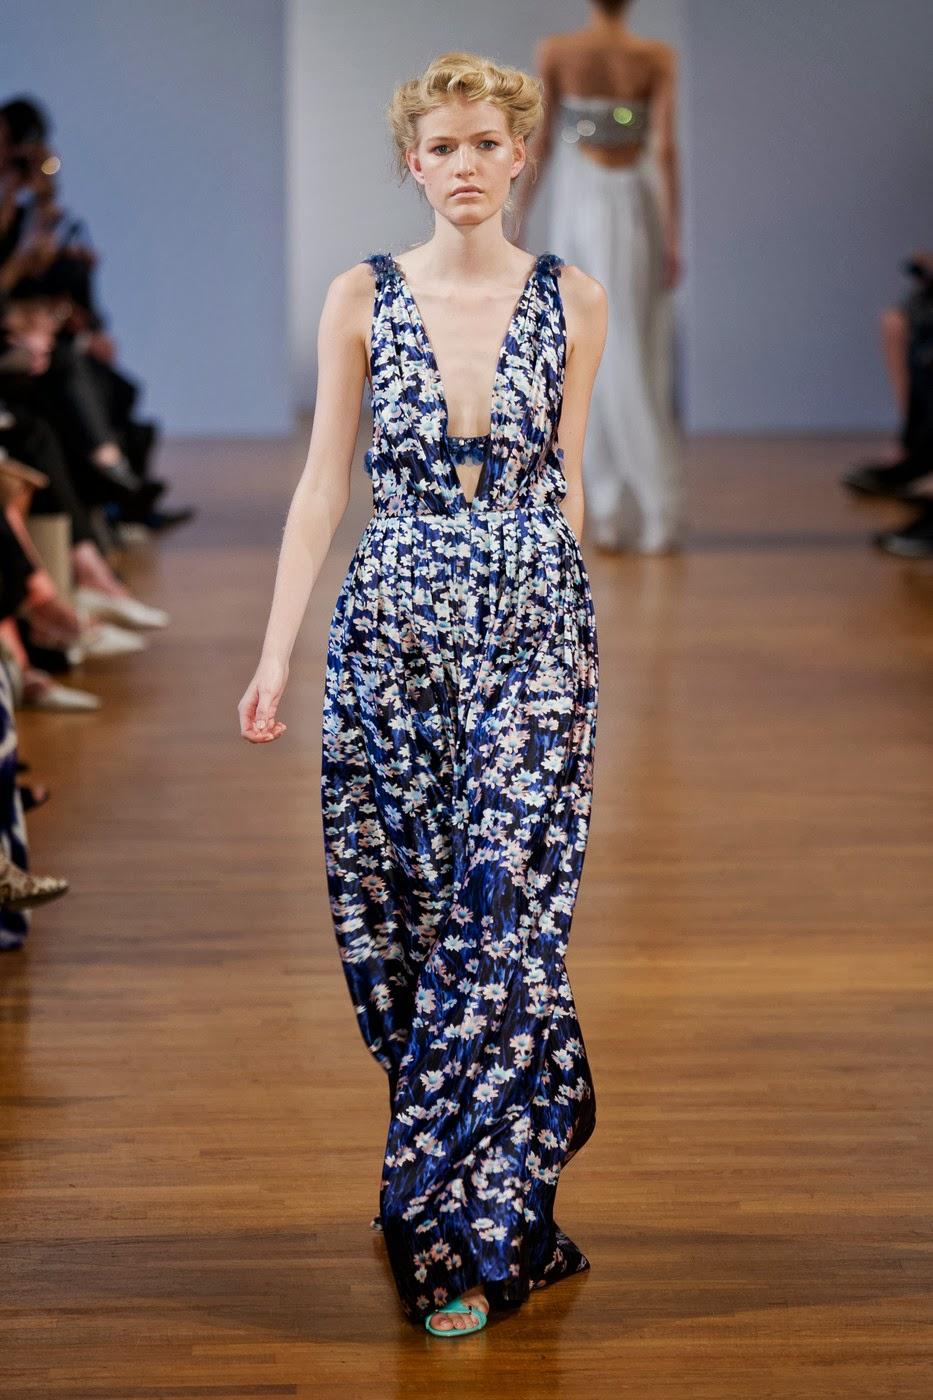 Collette dinnigan fashion show 56